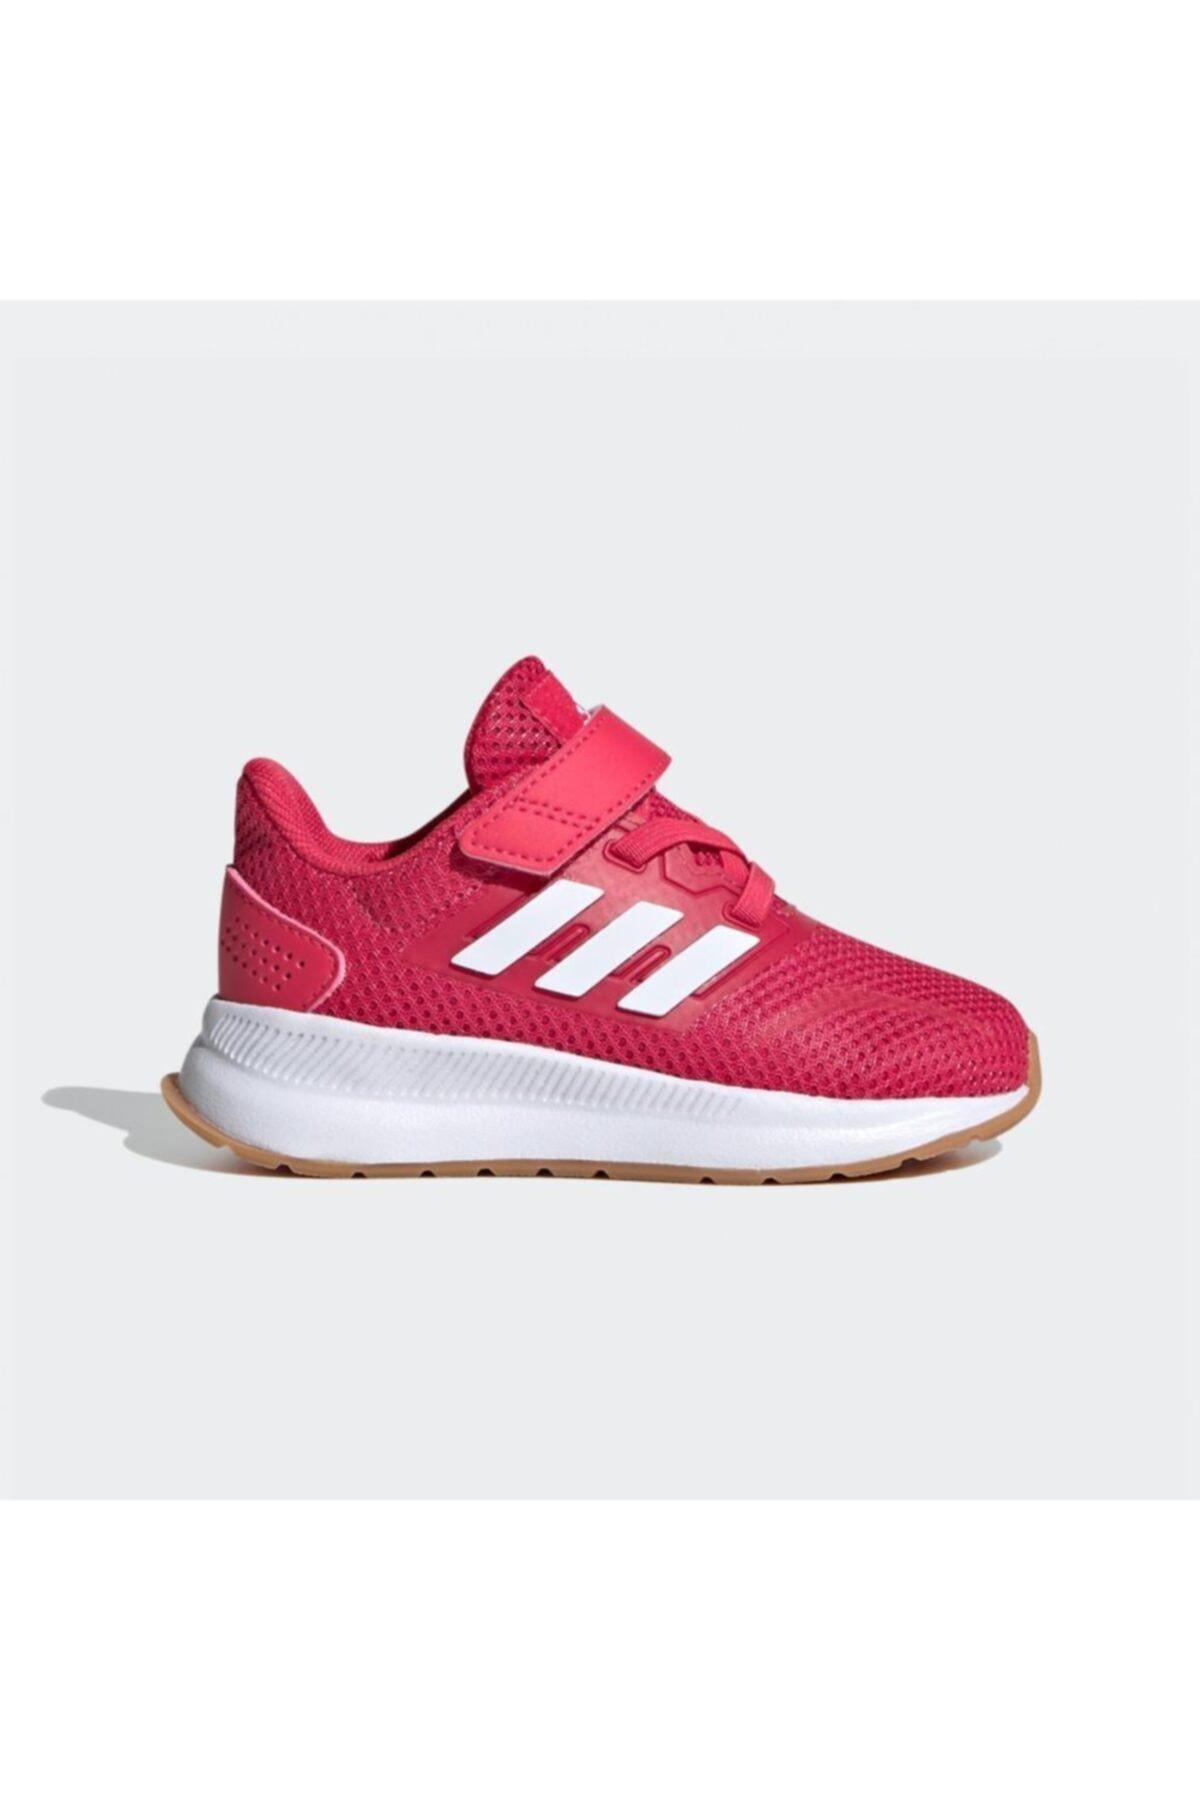 adidas Kız Çocuk Pembe Spor Ayakkabı Fw5156 1